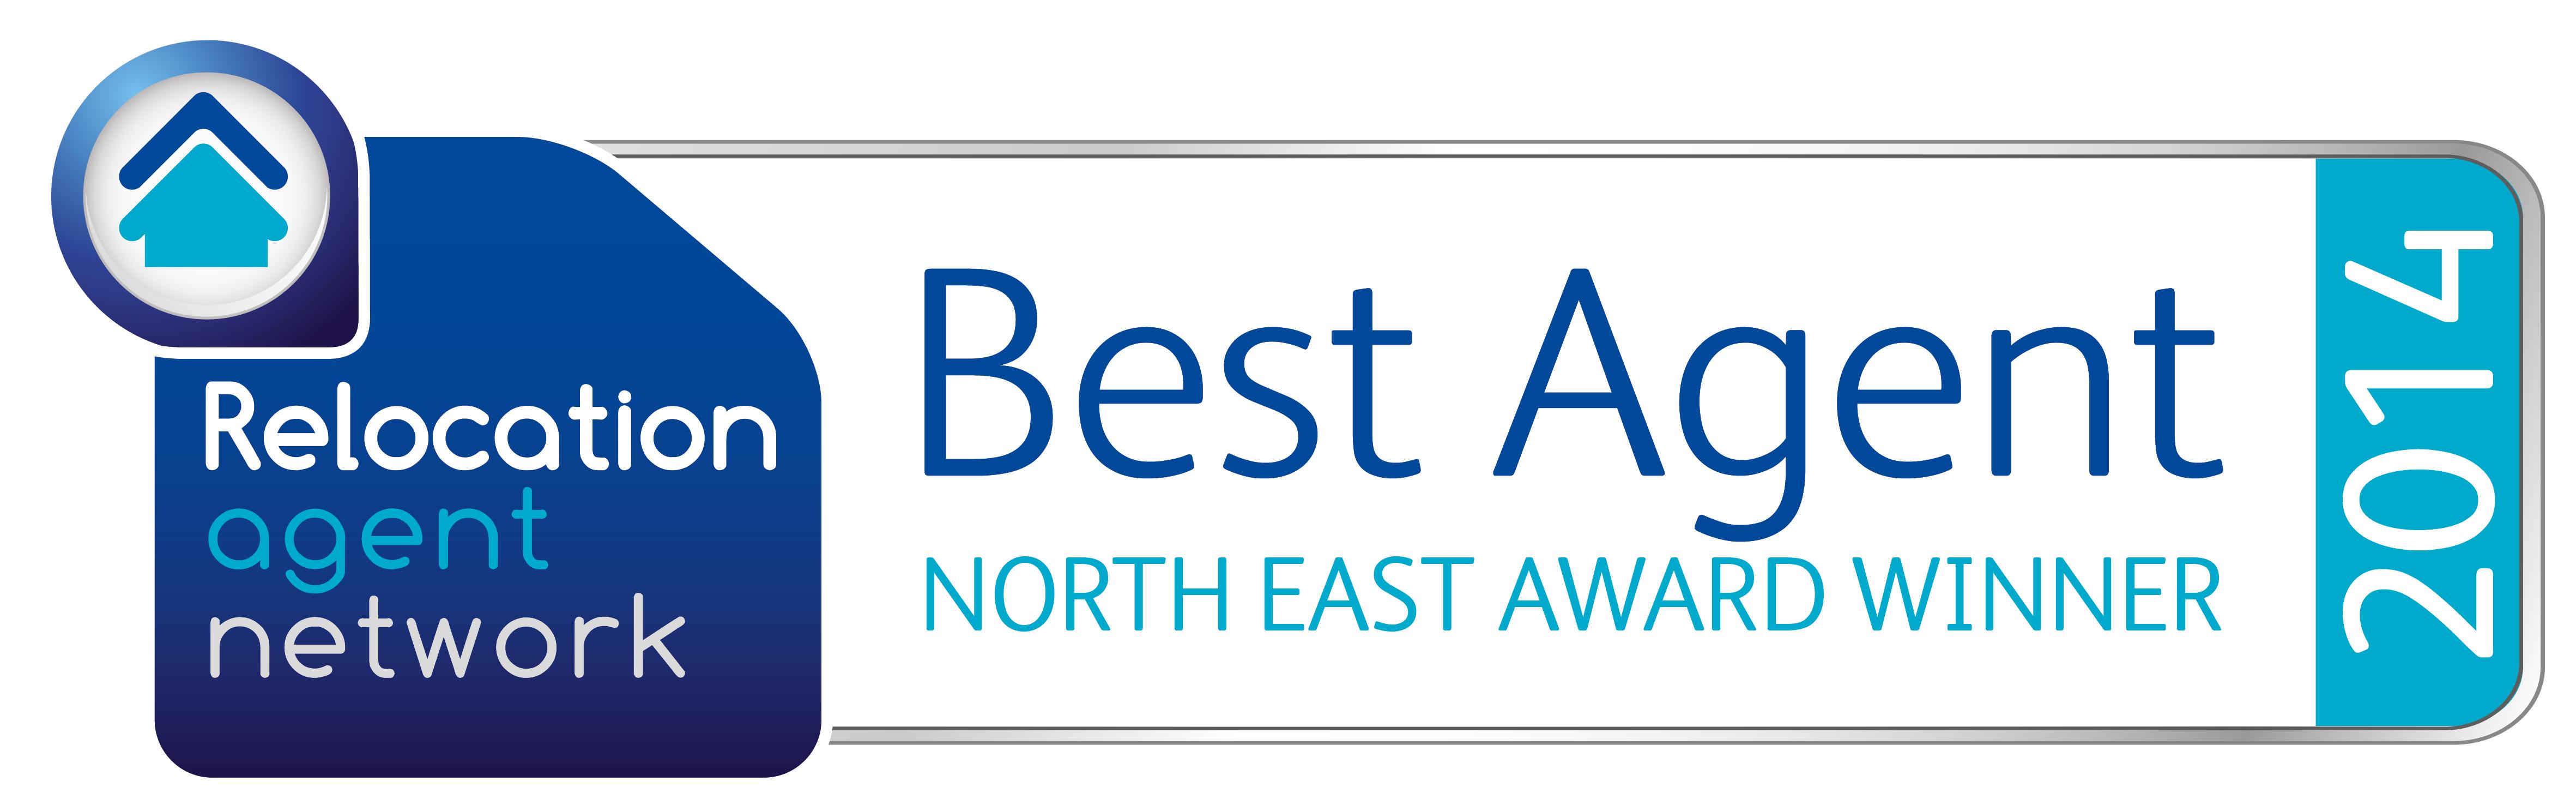 Relocation Agent Network Winner 2014